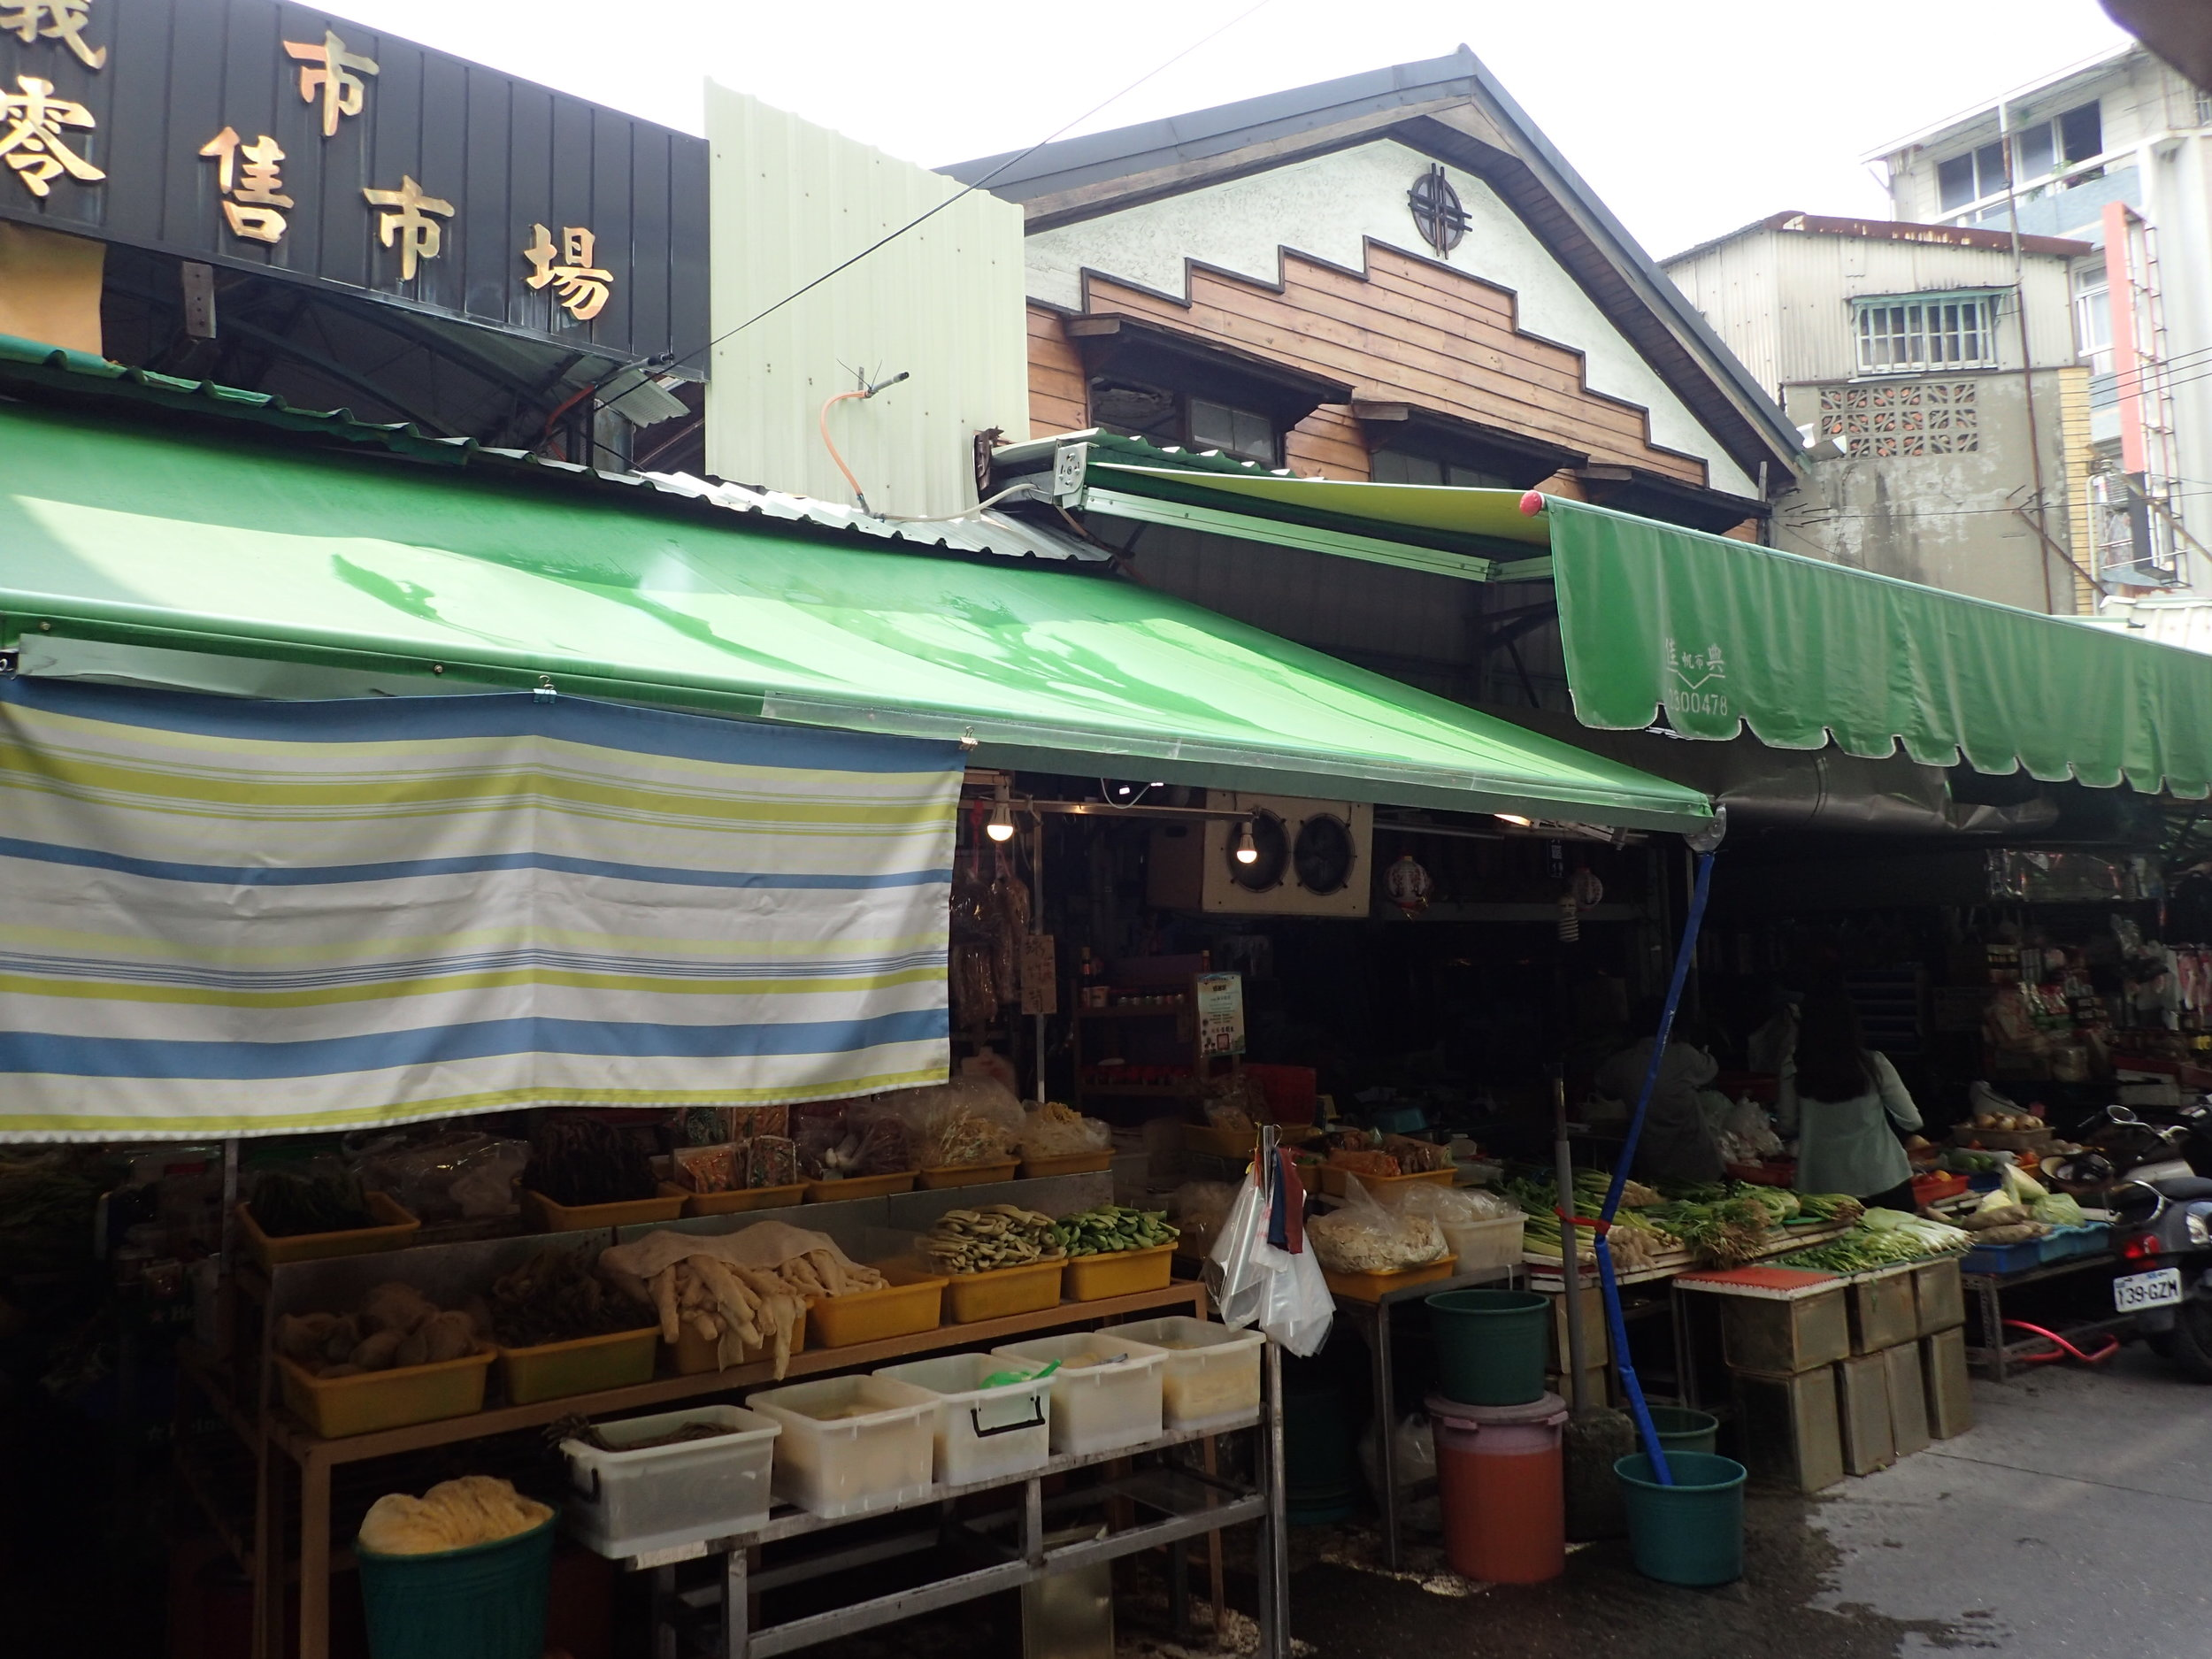 Chiayi's Dongmen Market